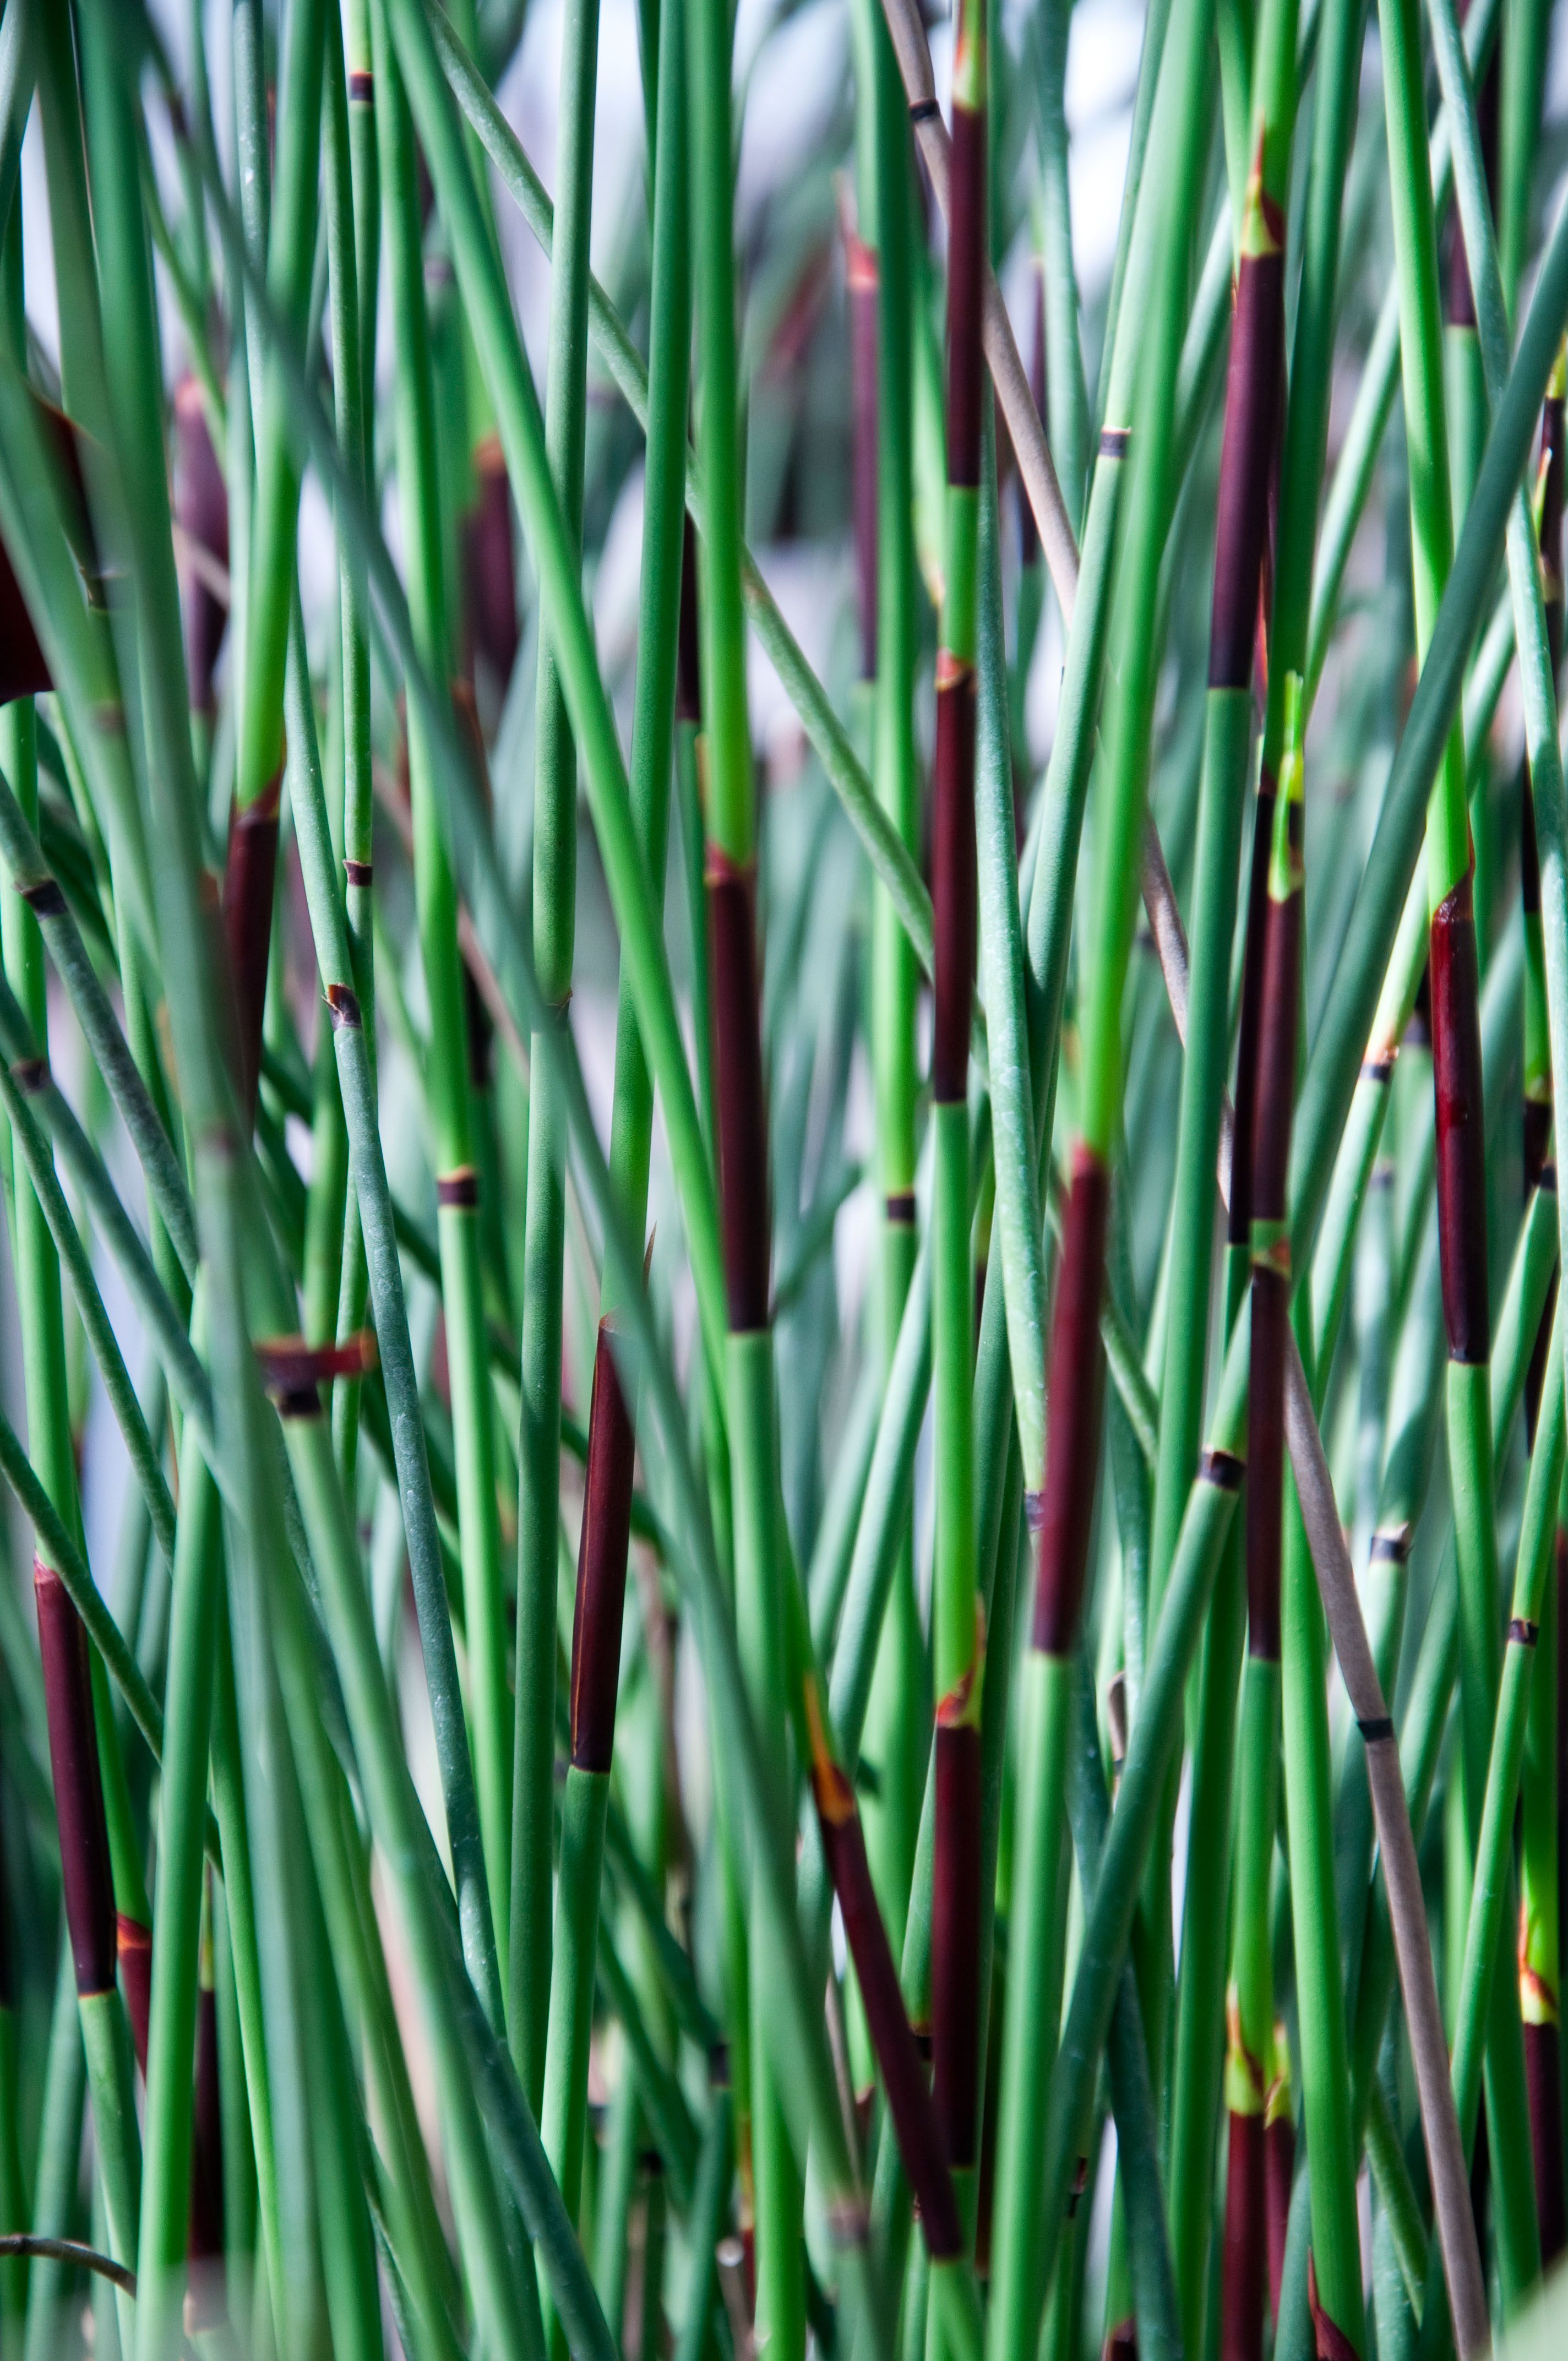 Horsetail Flowers, Garden, Plants